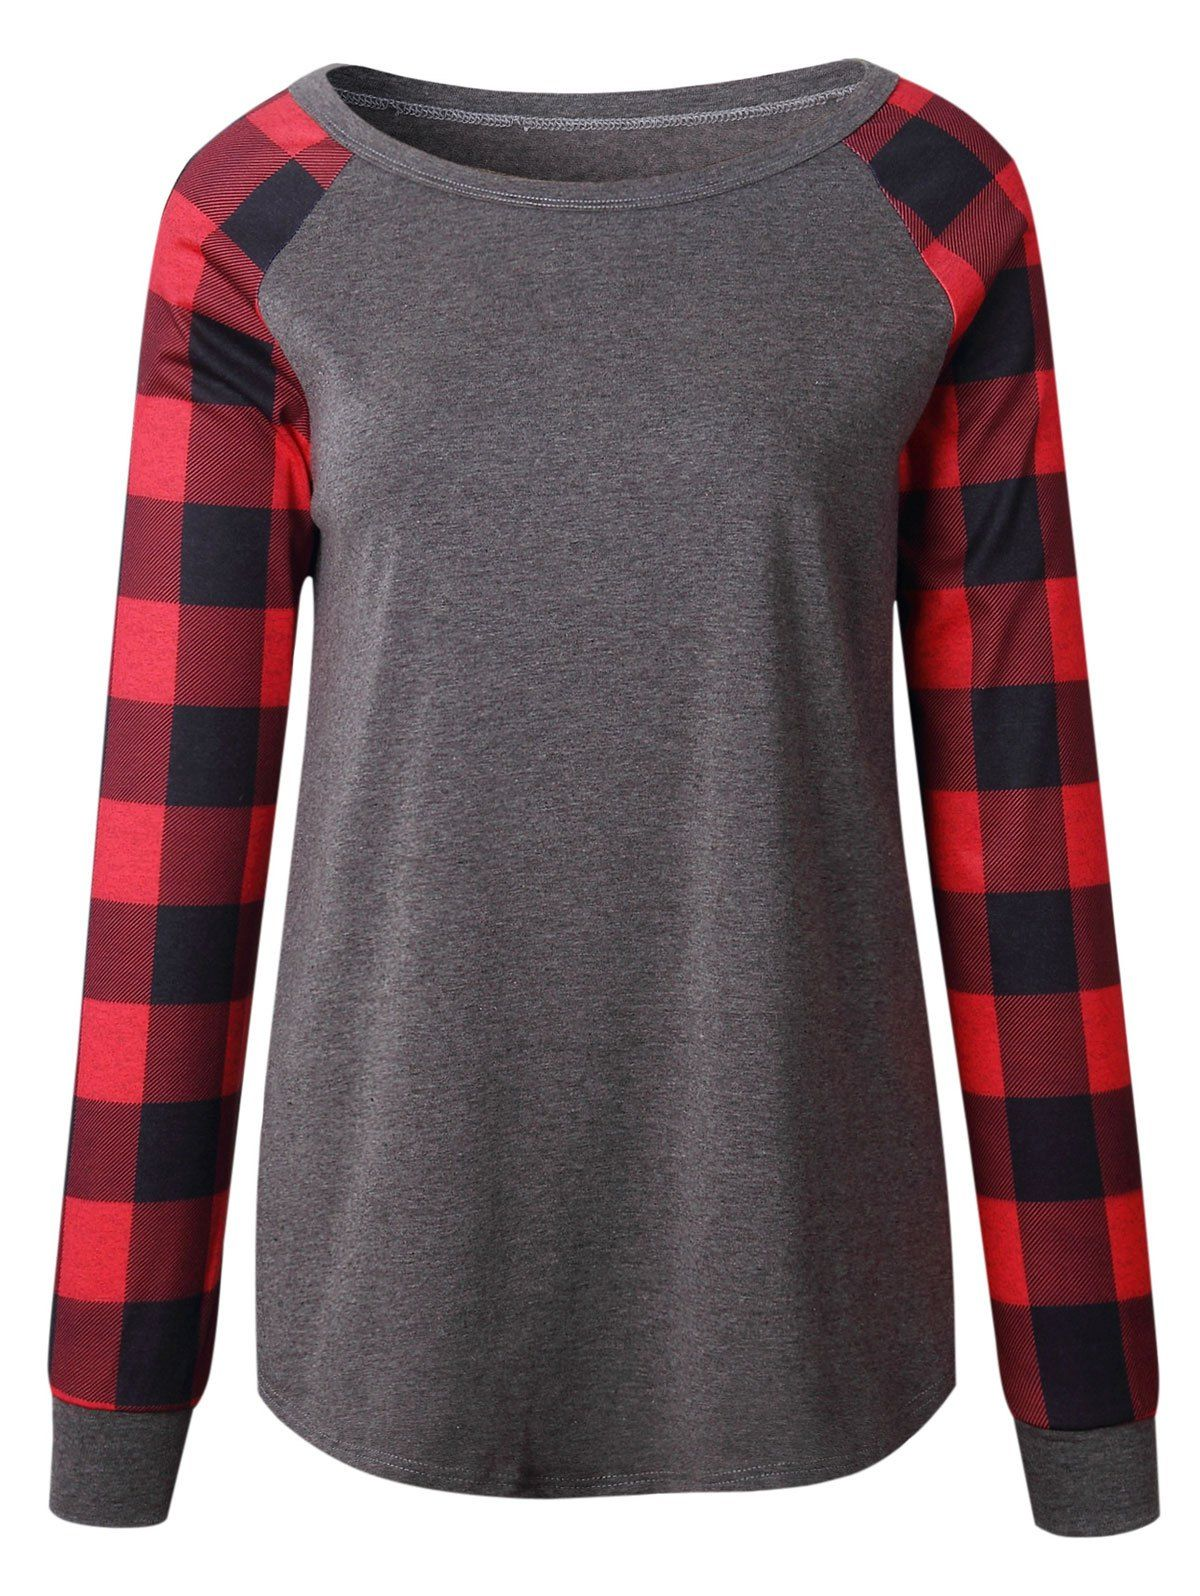 Shirts stylish online fotos